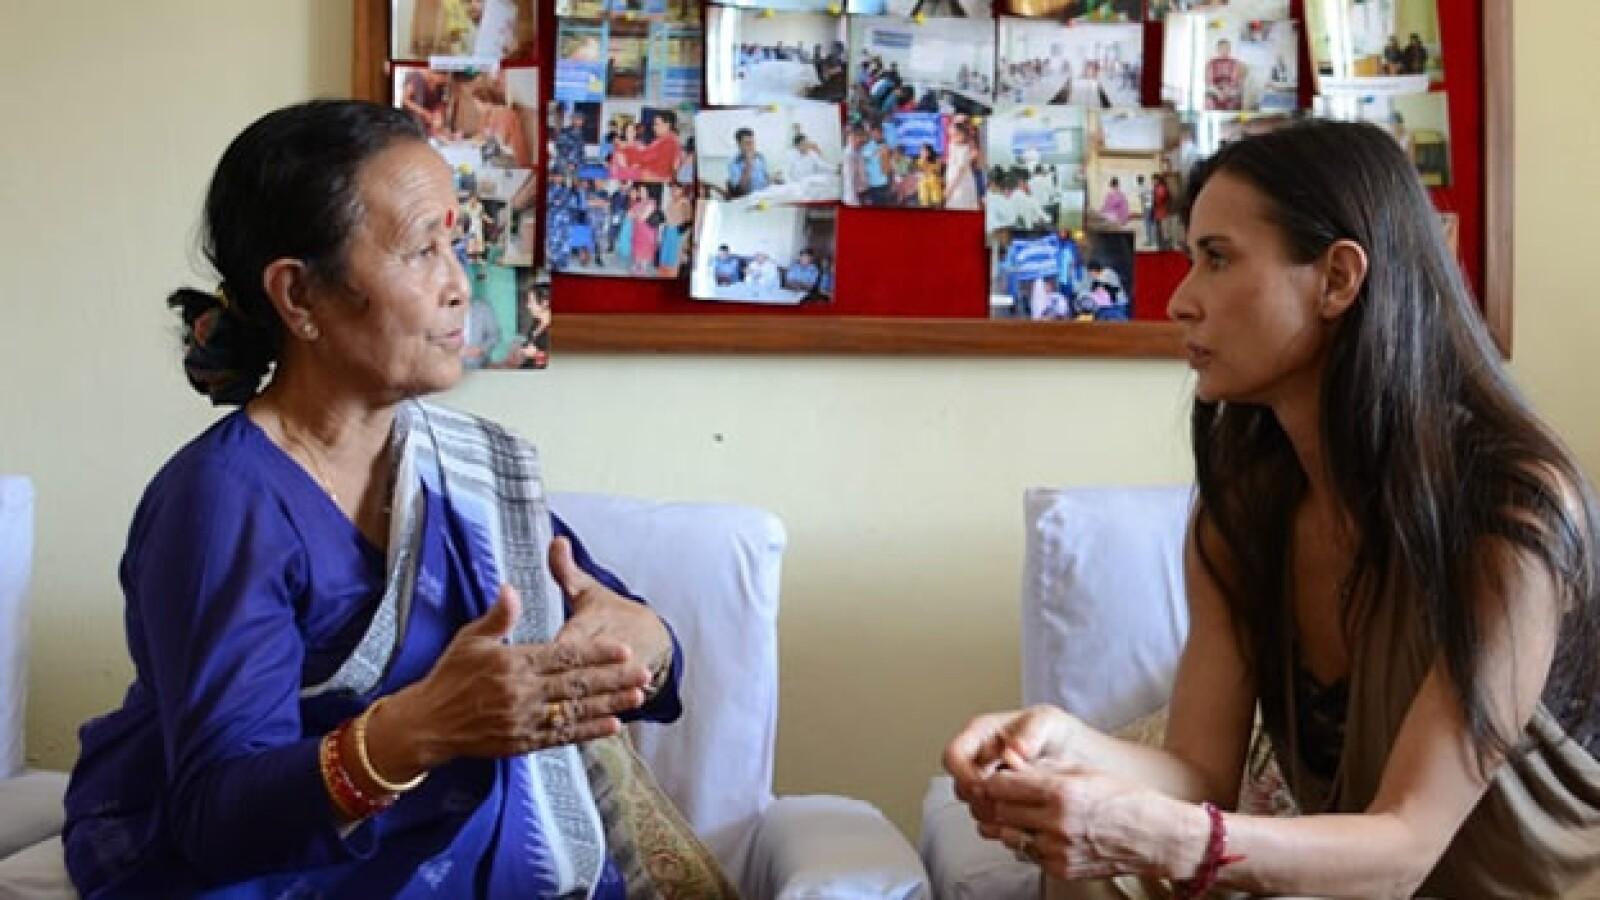 Proyecto Libertad - Anuradha Koirala - Demi Moore